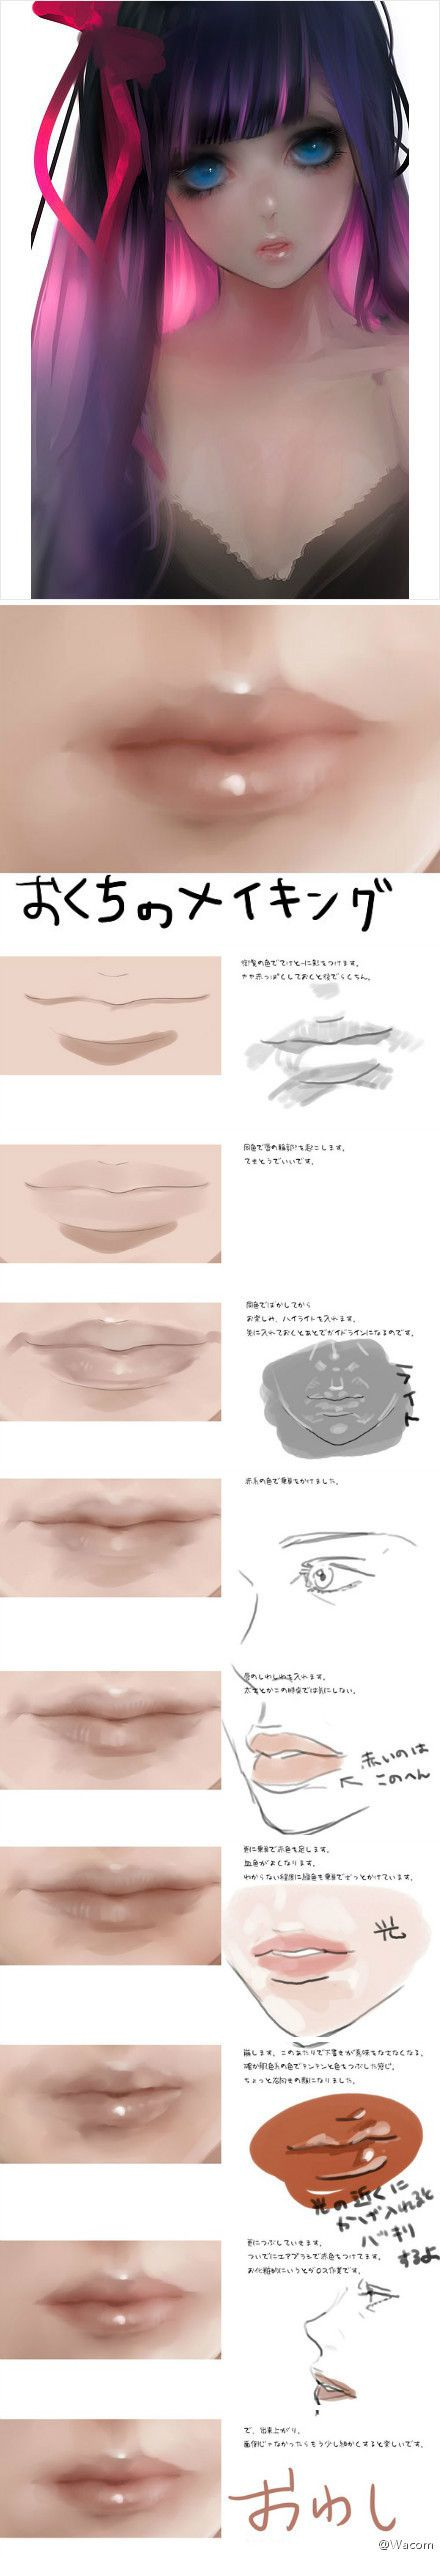 CG绘技法收集——嘴巴@原画梦采集到作画教程(367图)_花瓣插画